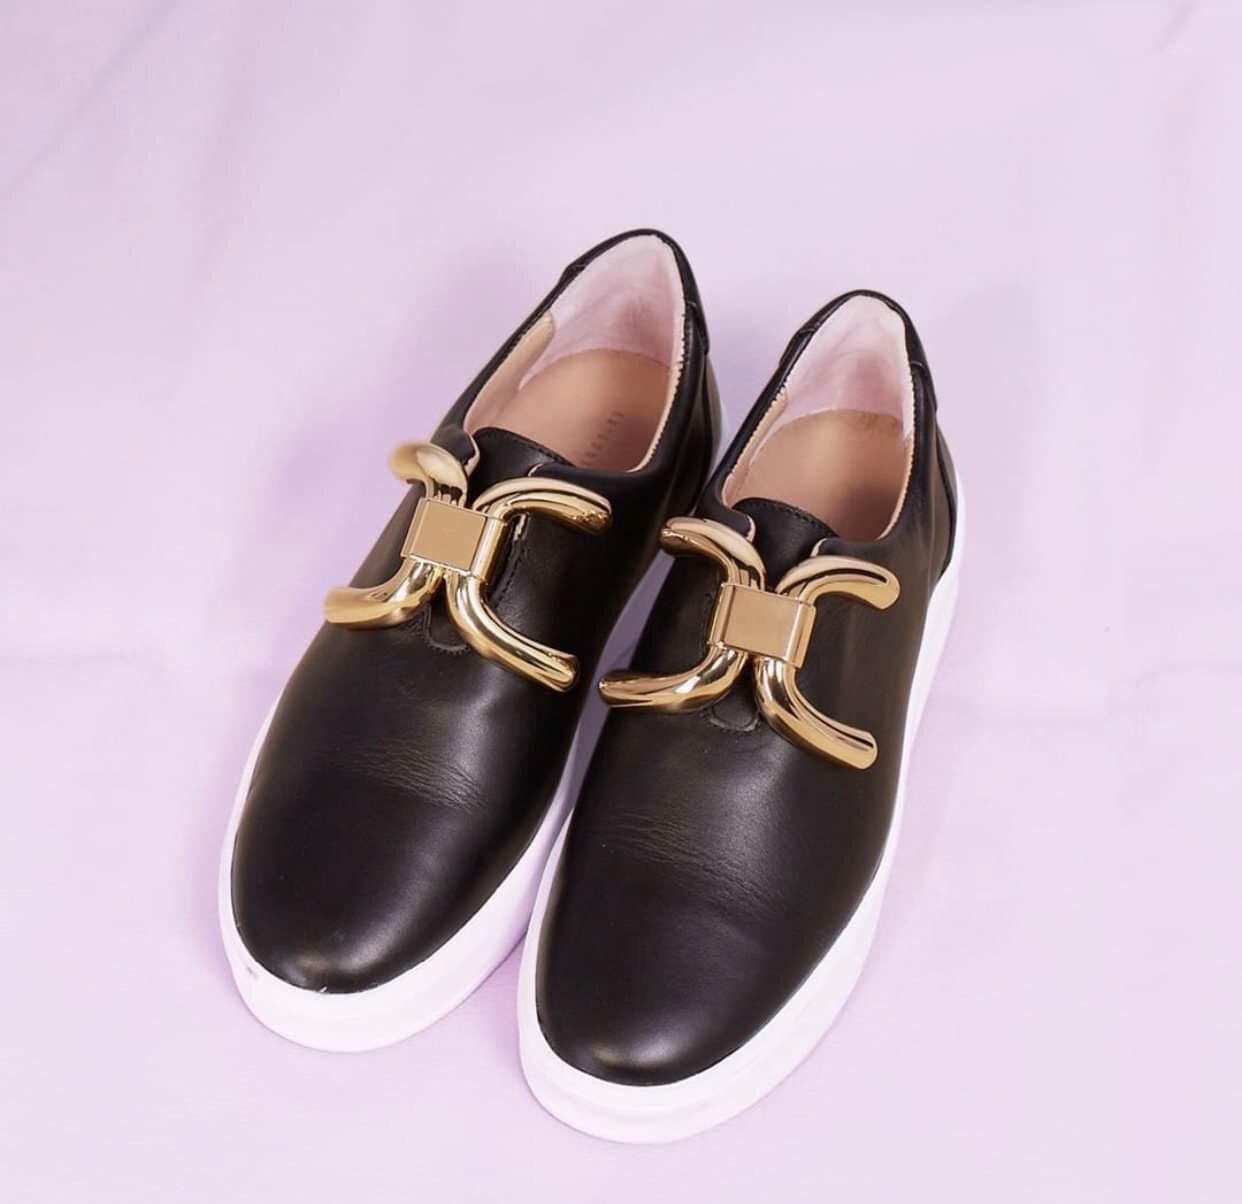 Luxe Buckle Sneaker - Black & Gold